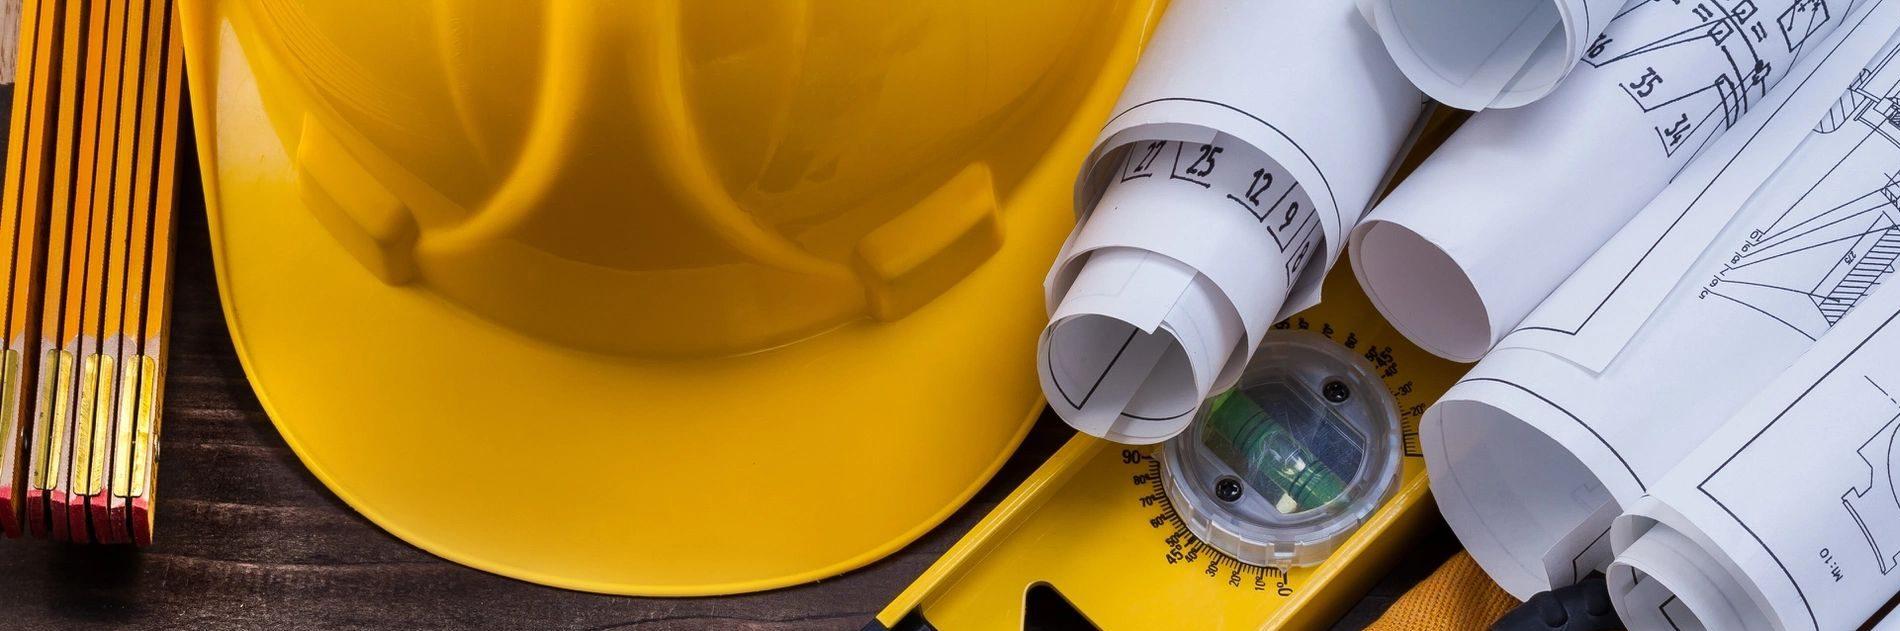 Commercial Construction Regulations